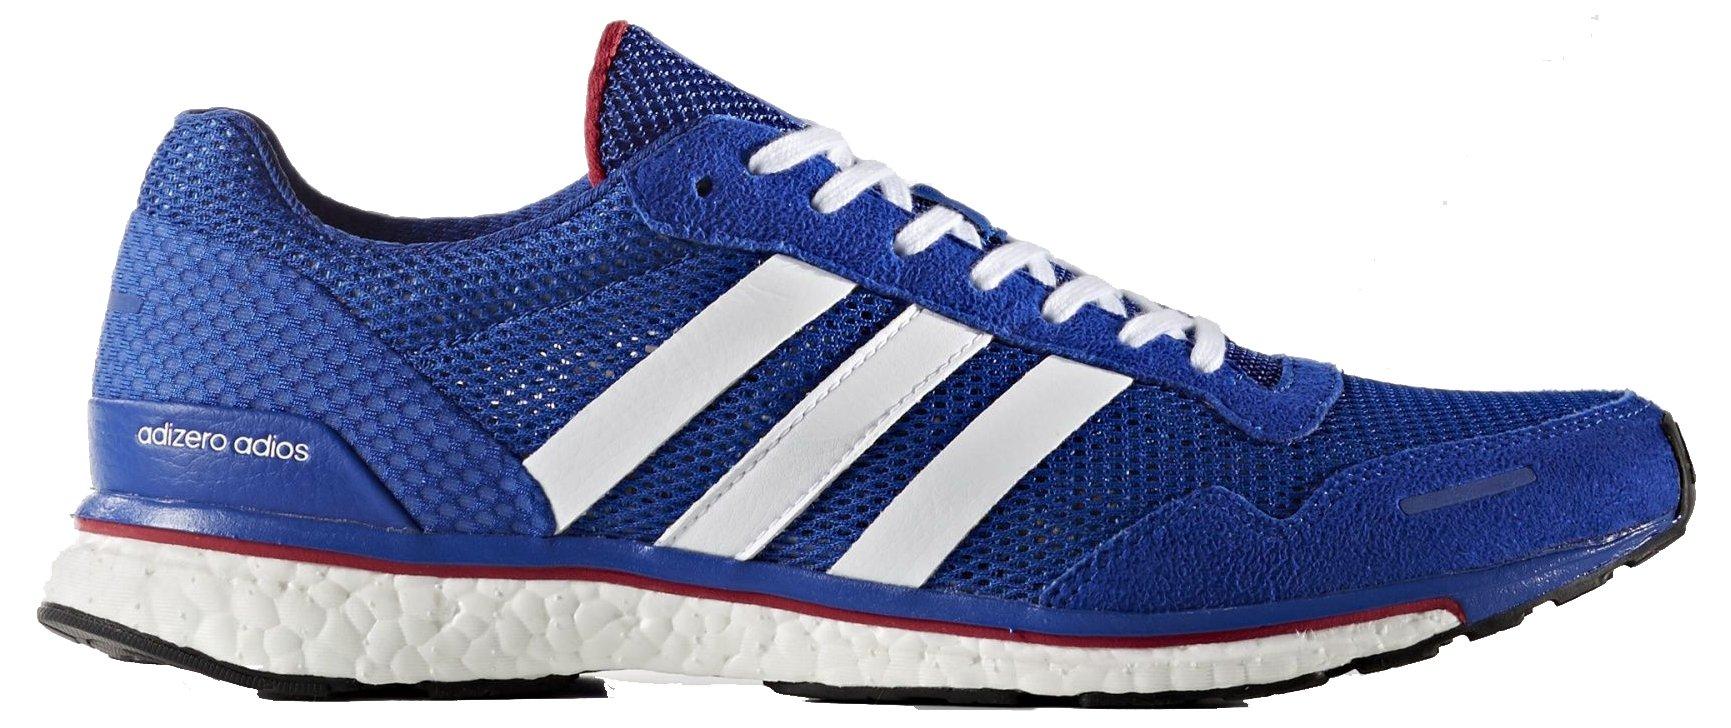 Běžecké boty adidas Adizero Adios 3